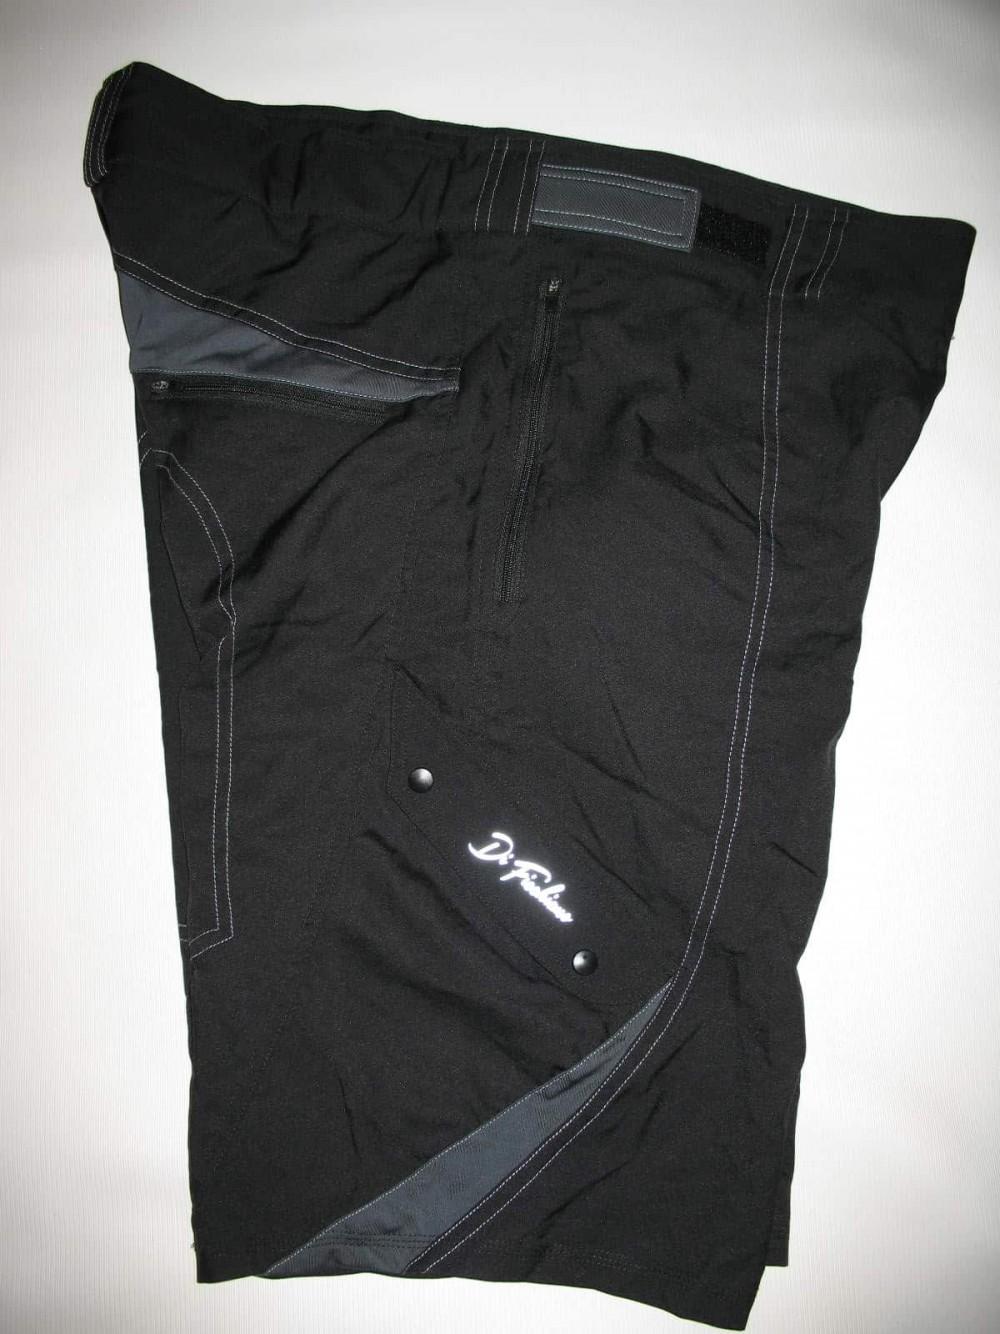 Велошорты DI FICCHIANO lecce MTB shorts (размер XXL) - 5